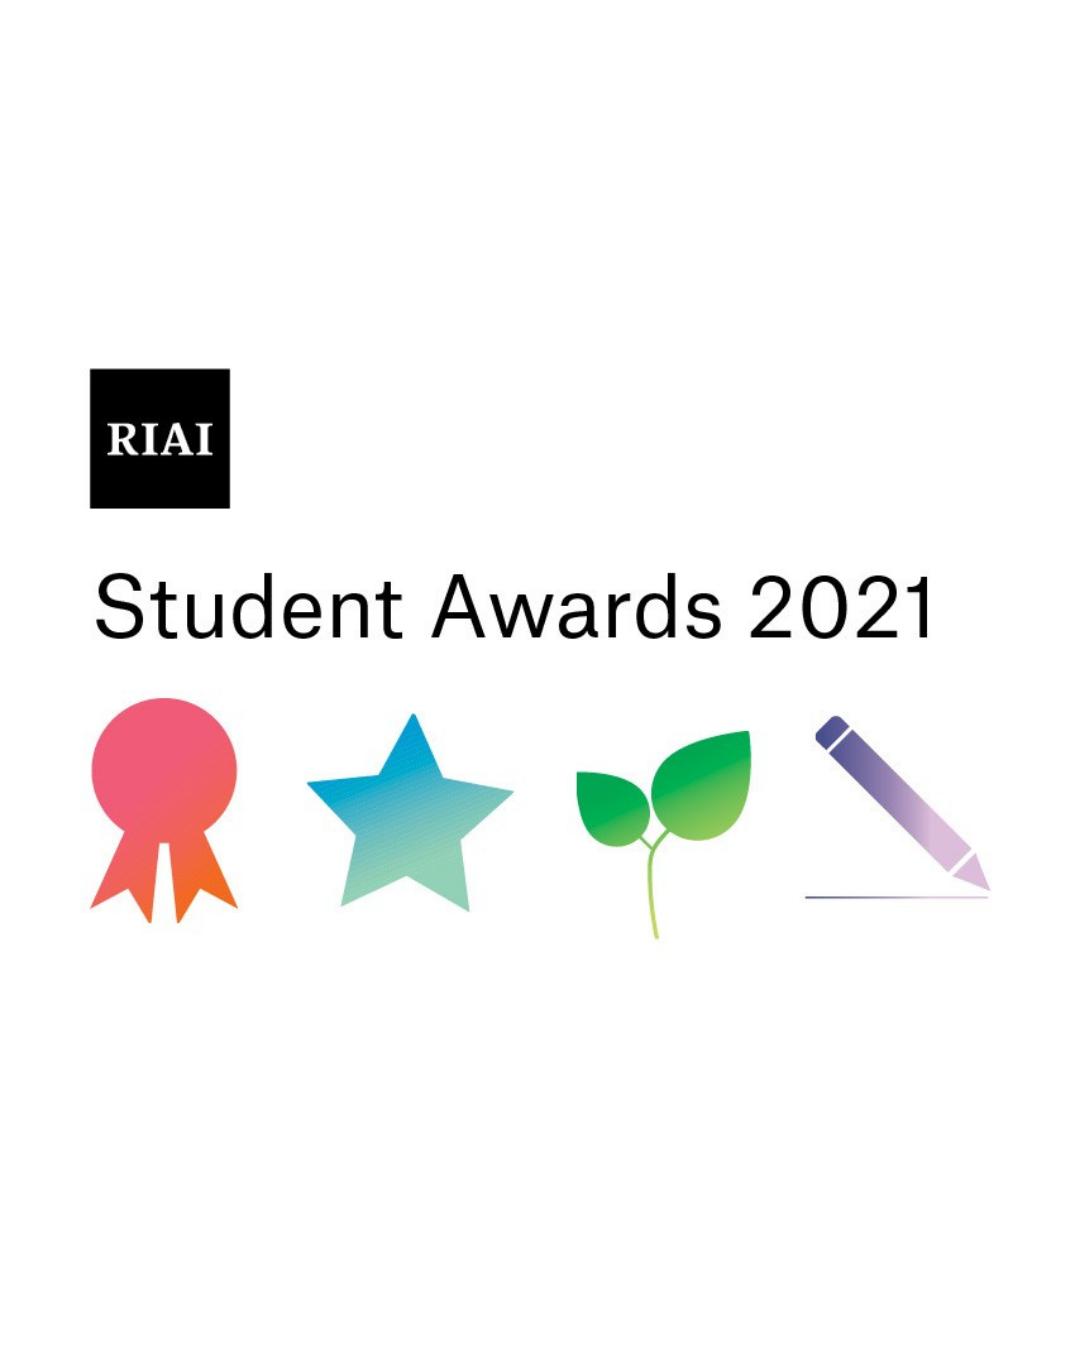 RIAI Student Awards